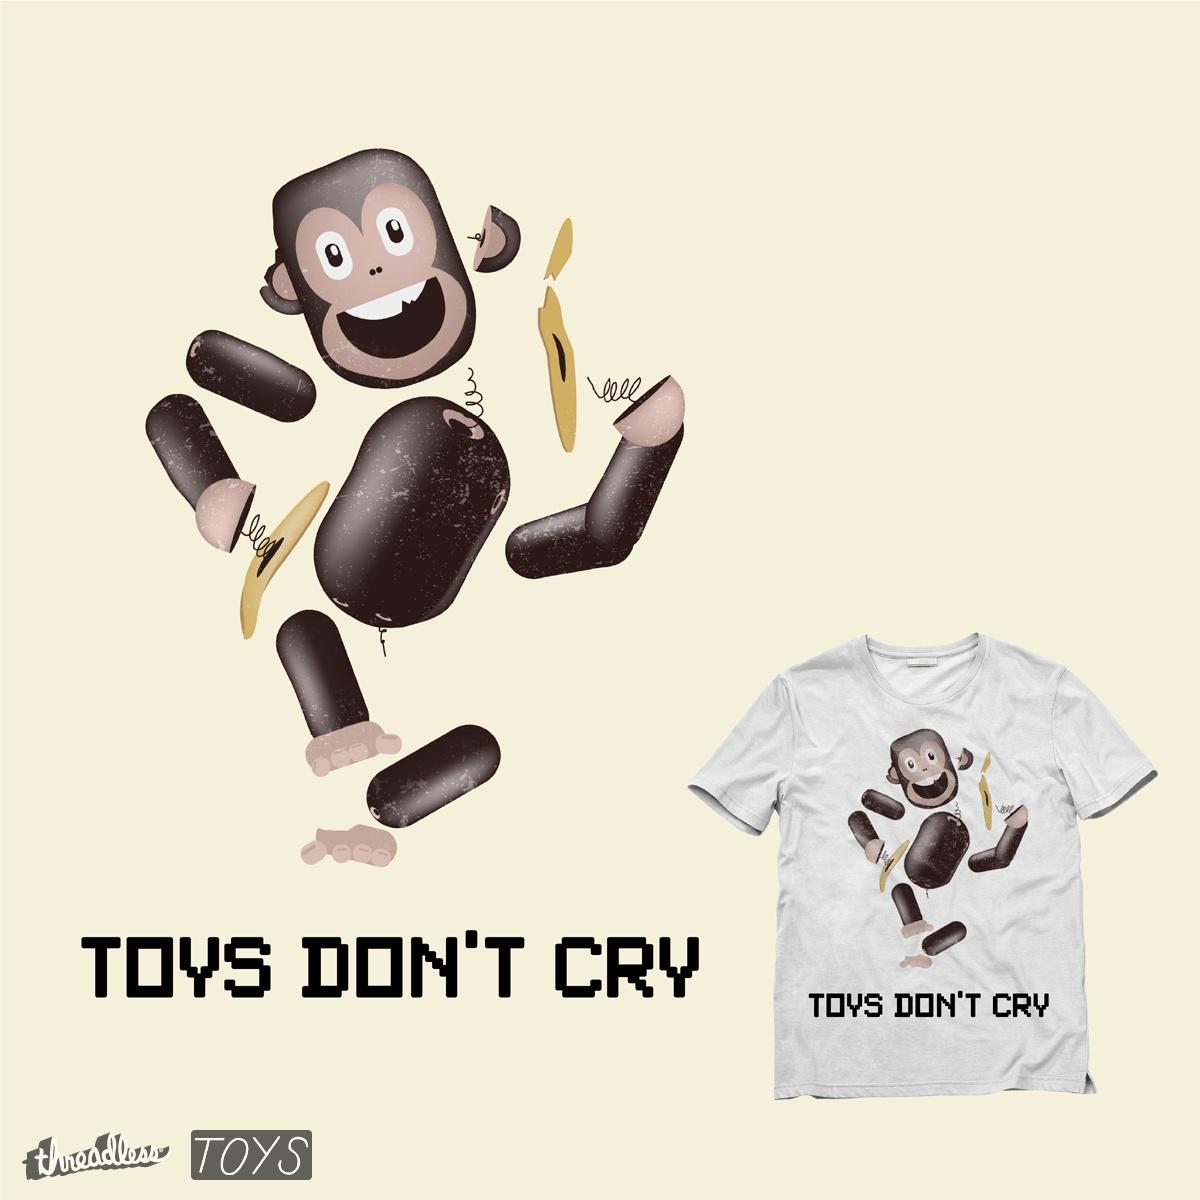 Toys don't cry by mrsharma on Threadless